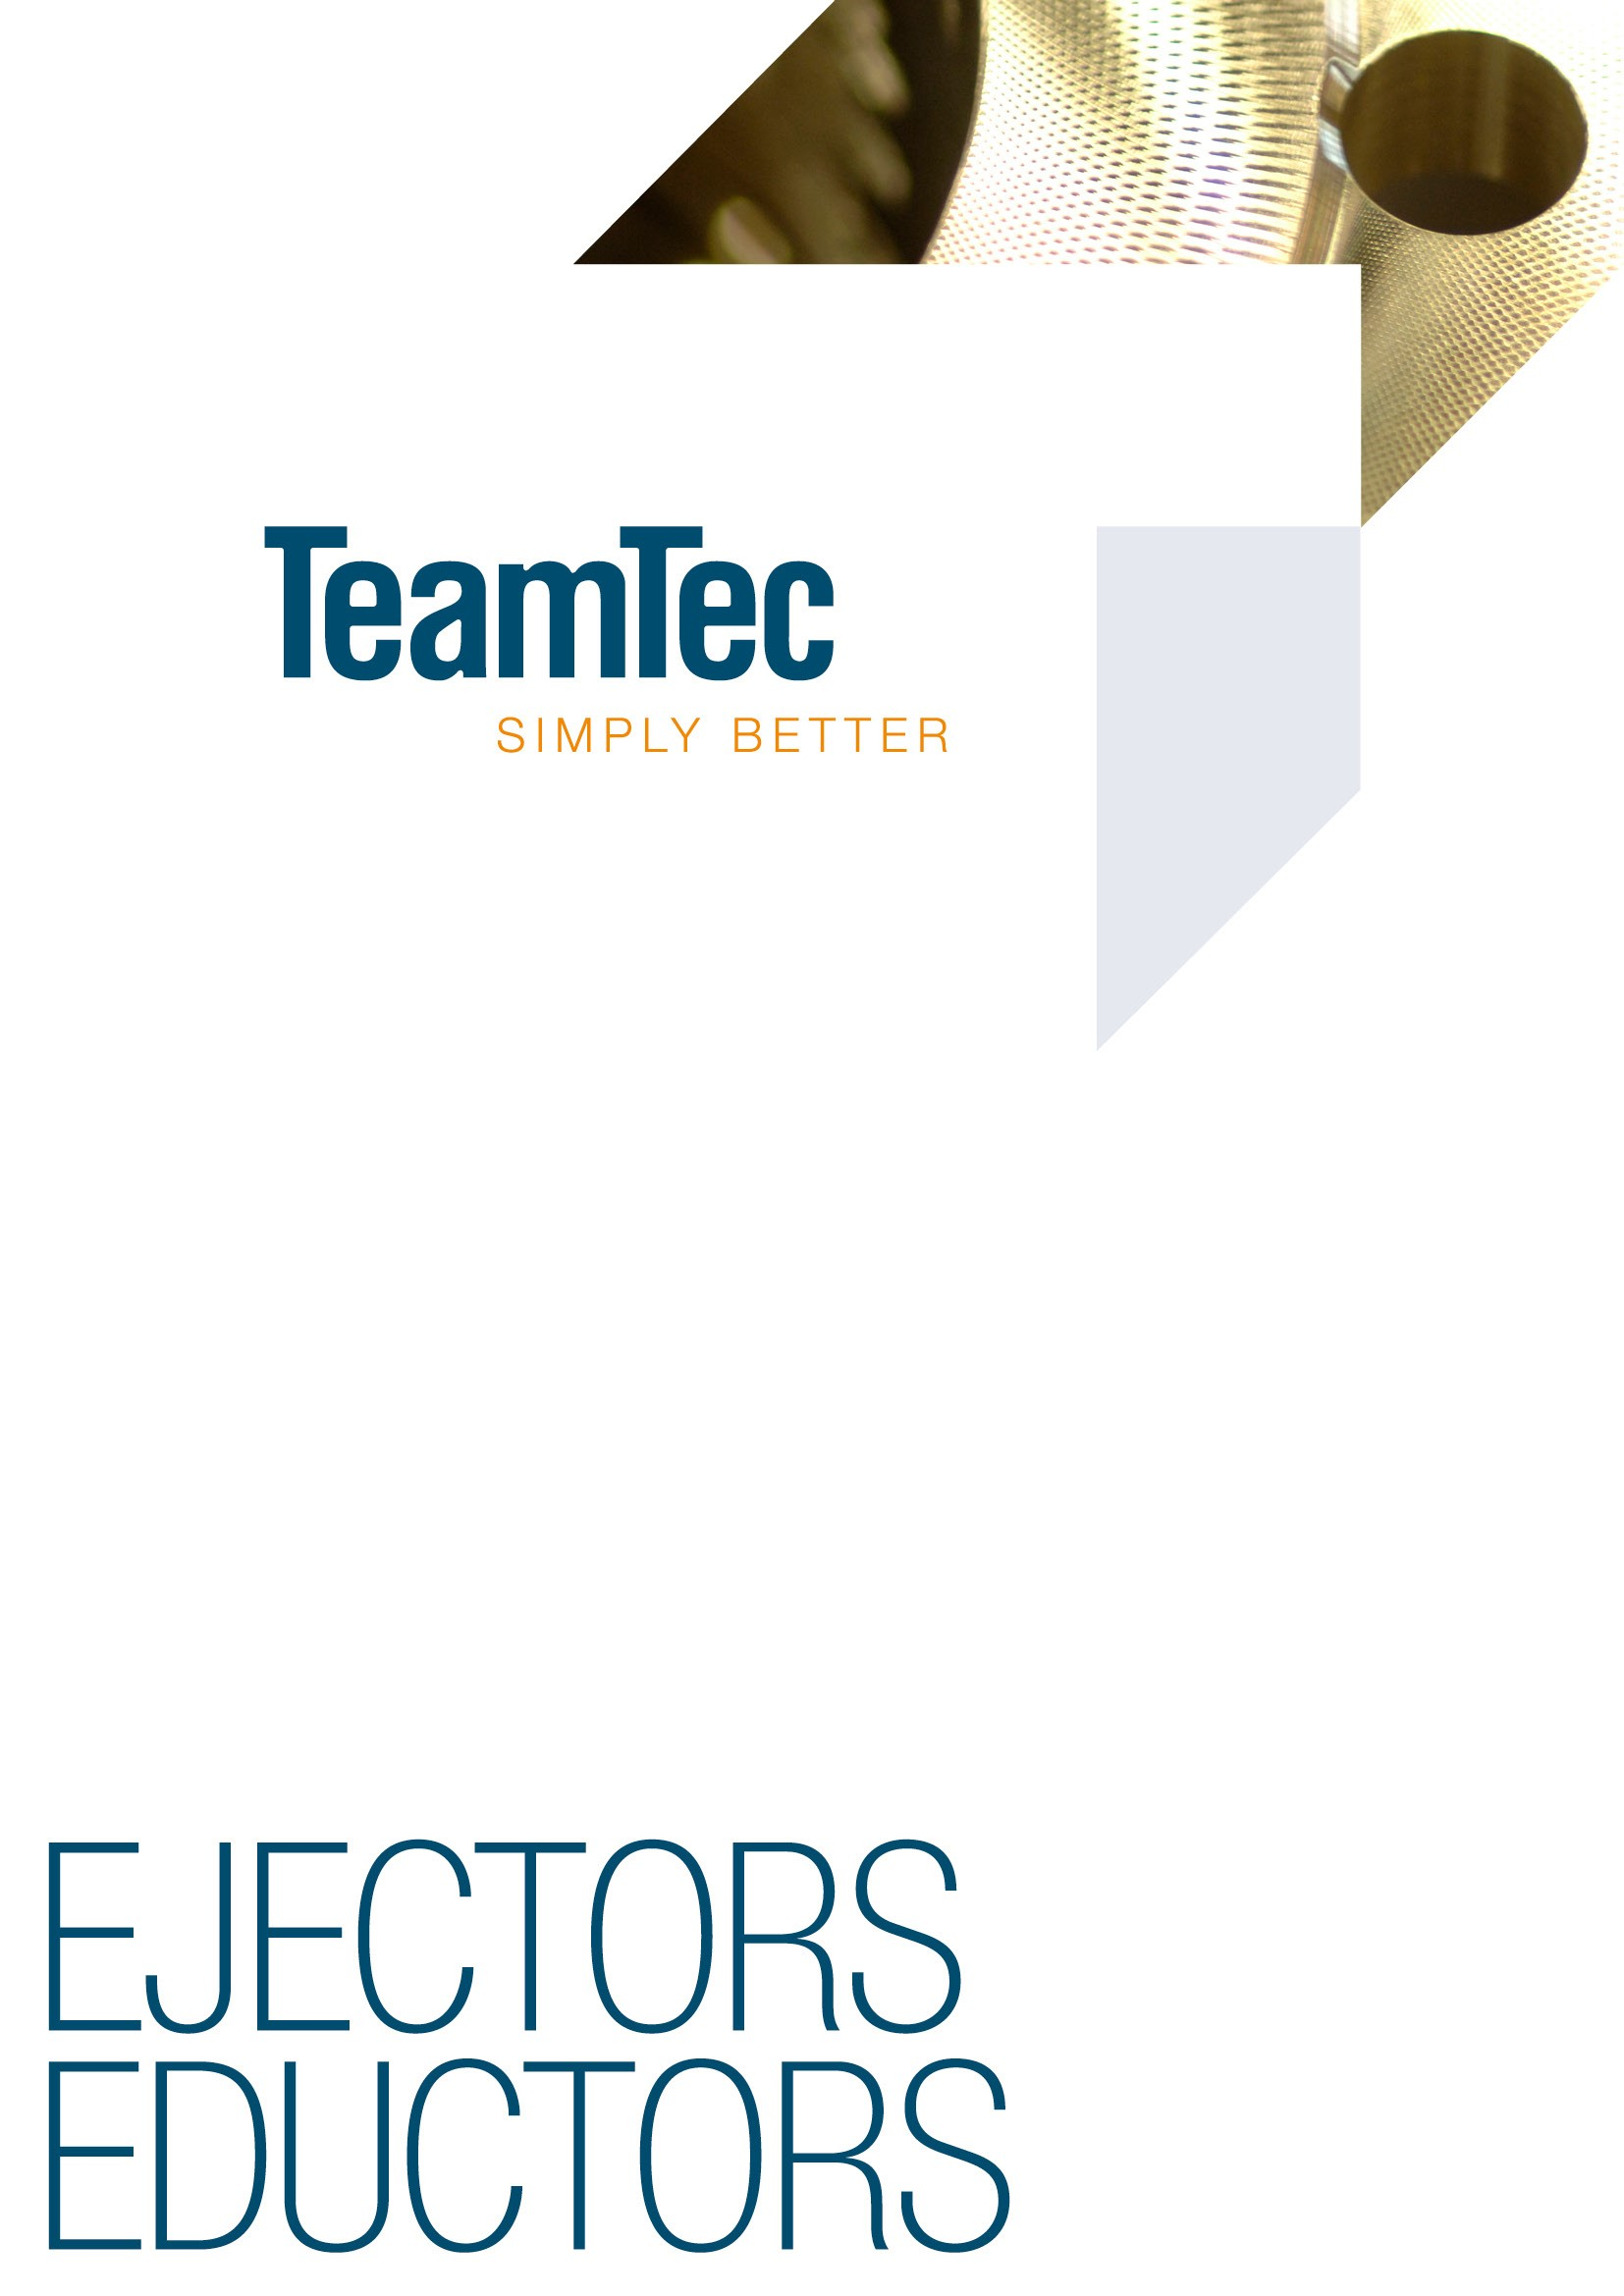 TeamTec Ejector